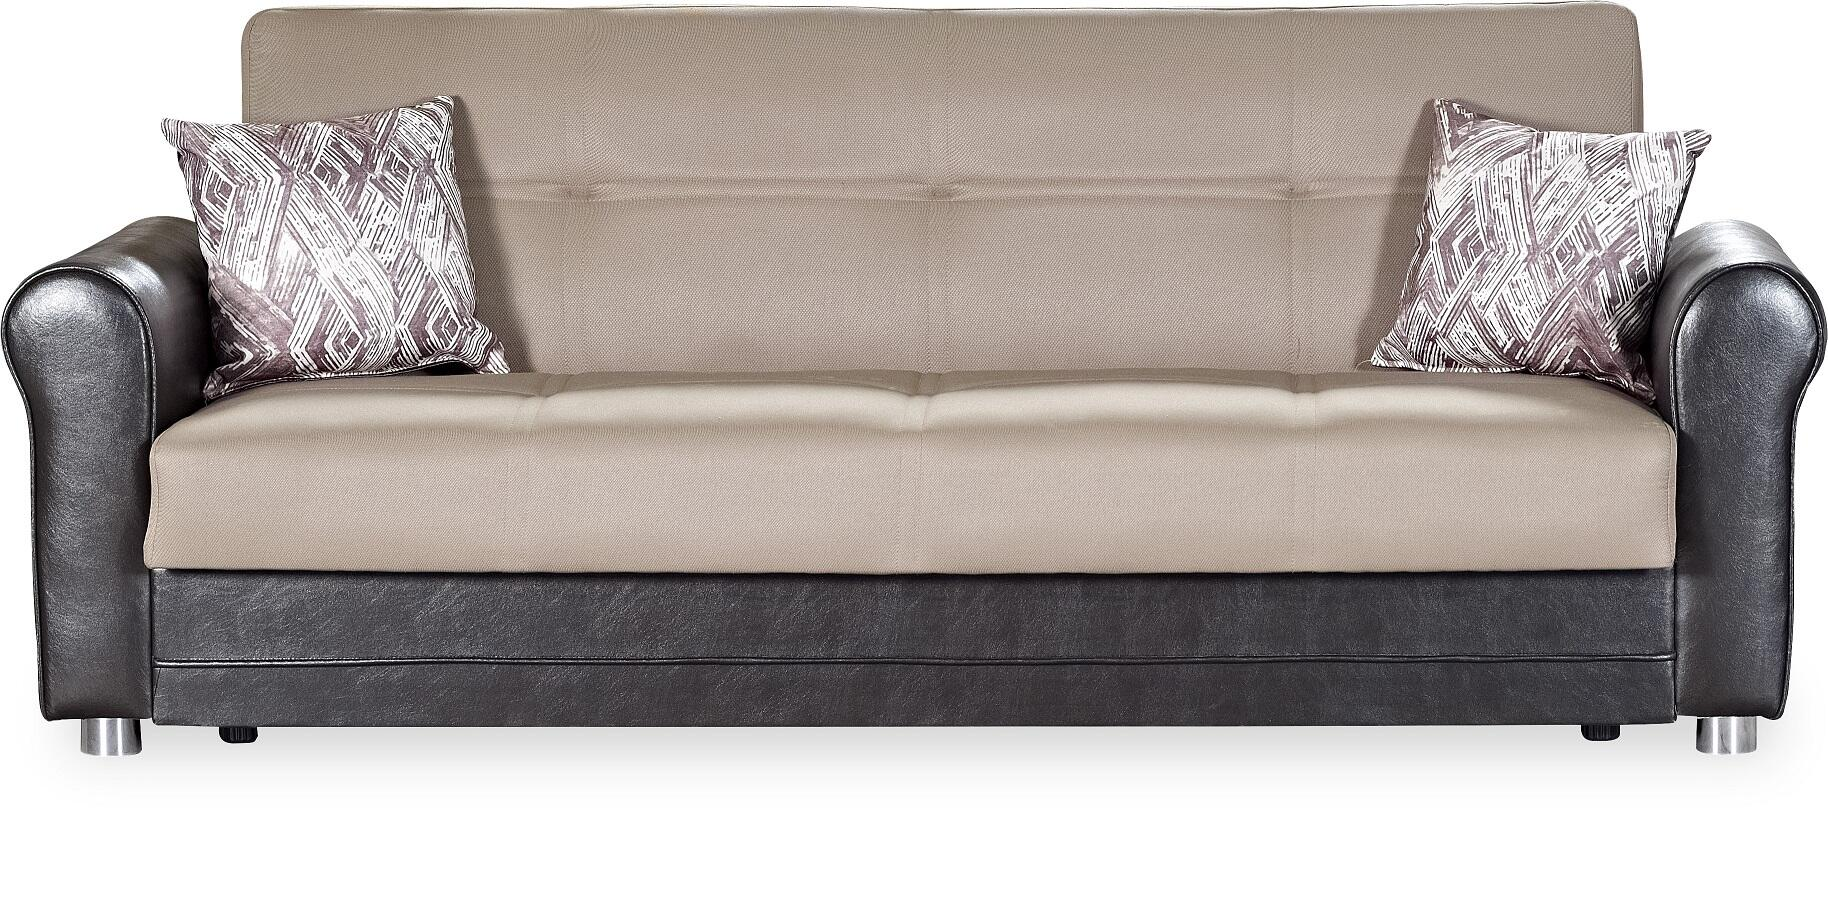 Enjoyable Casamode Avalonplussofabed Cjindustries Chair Design For Home Cjindustriesco